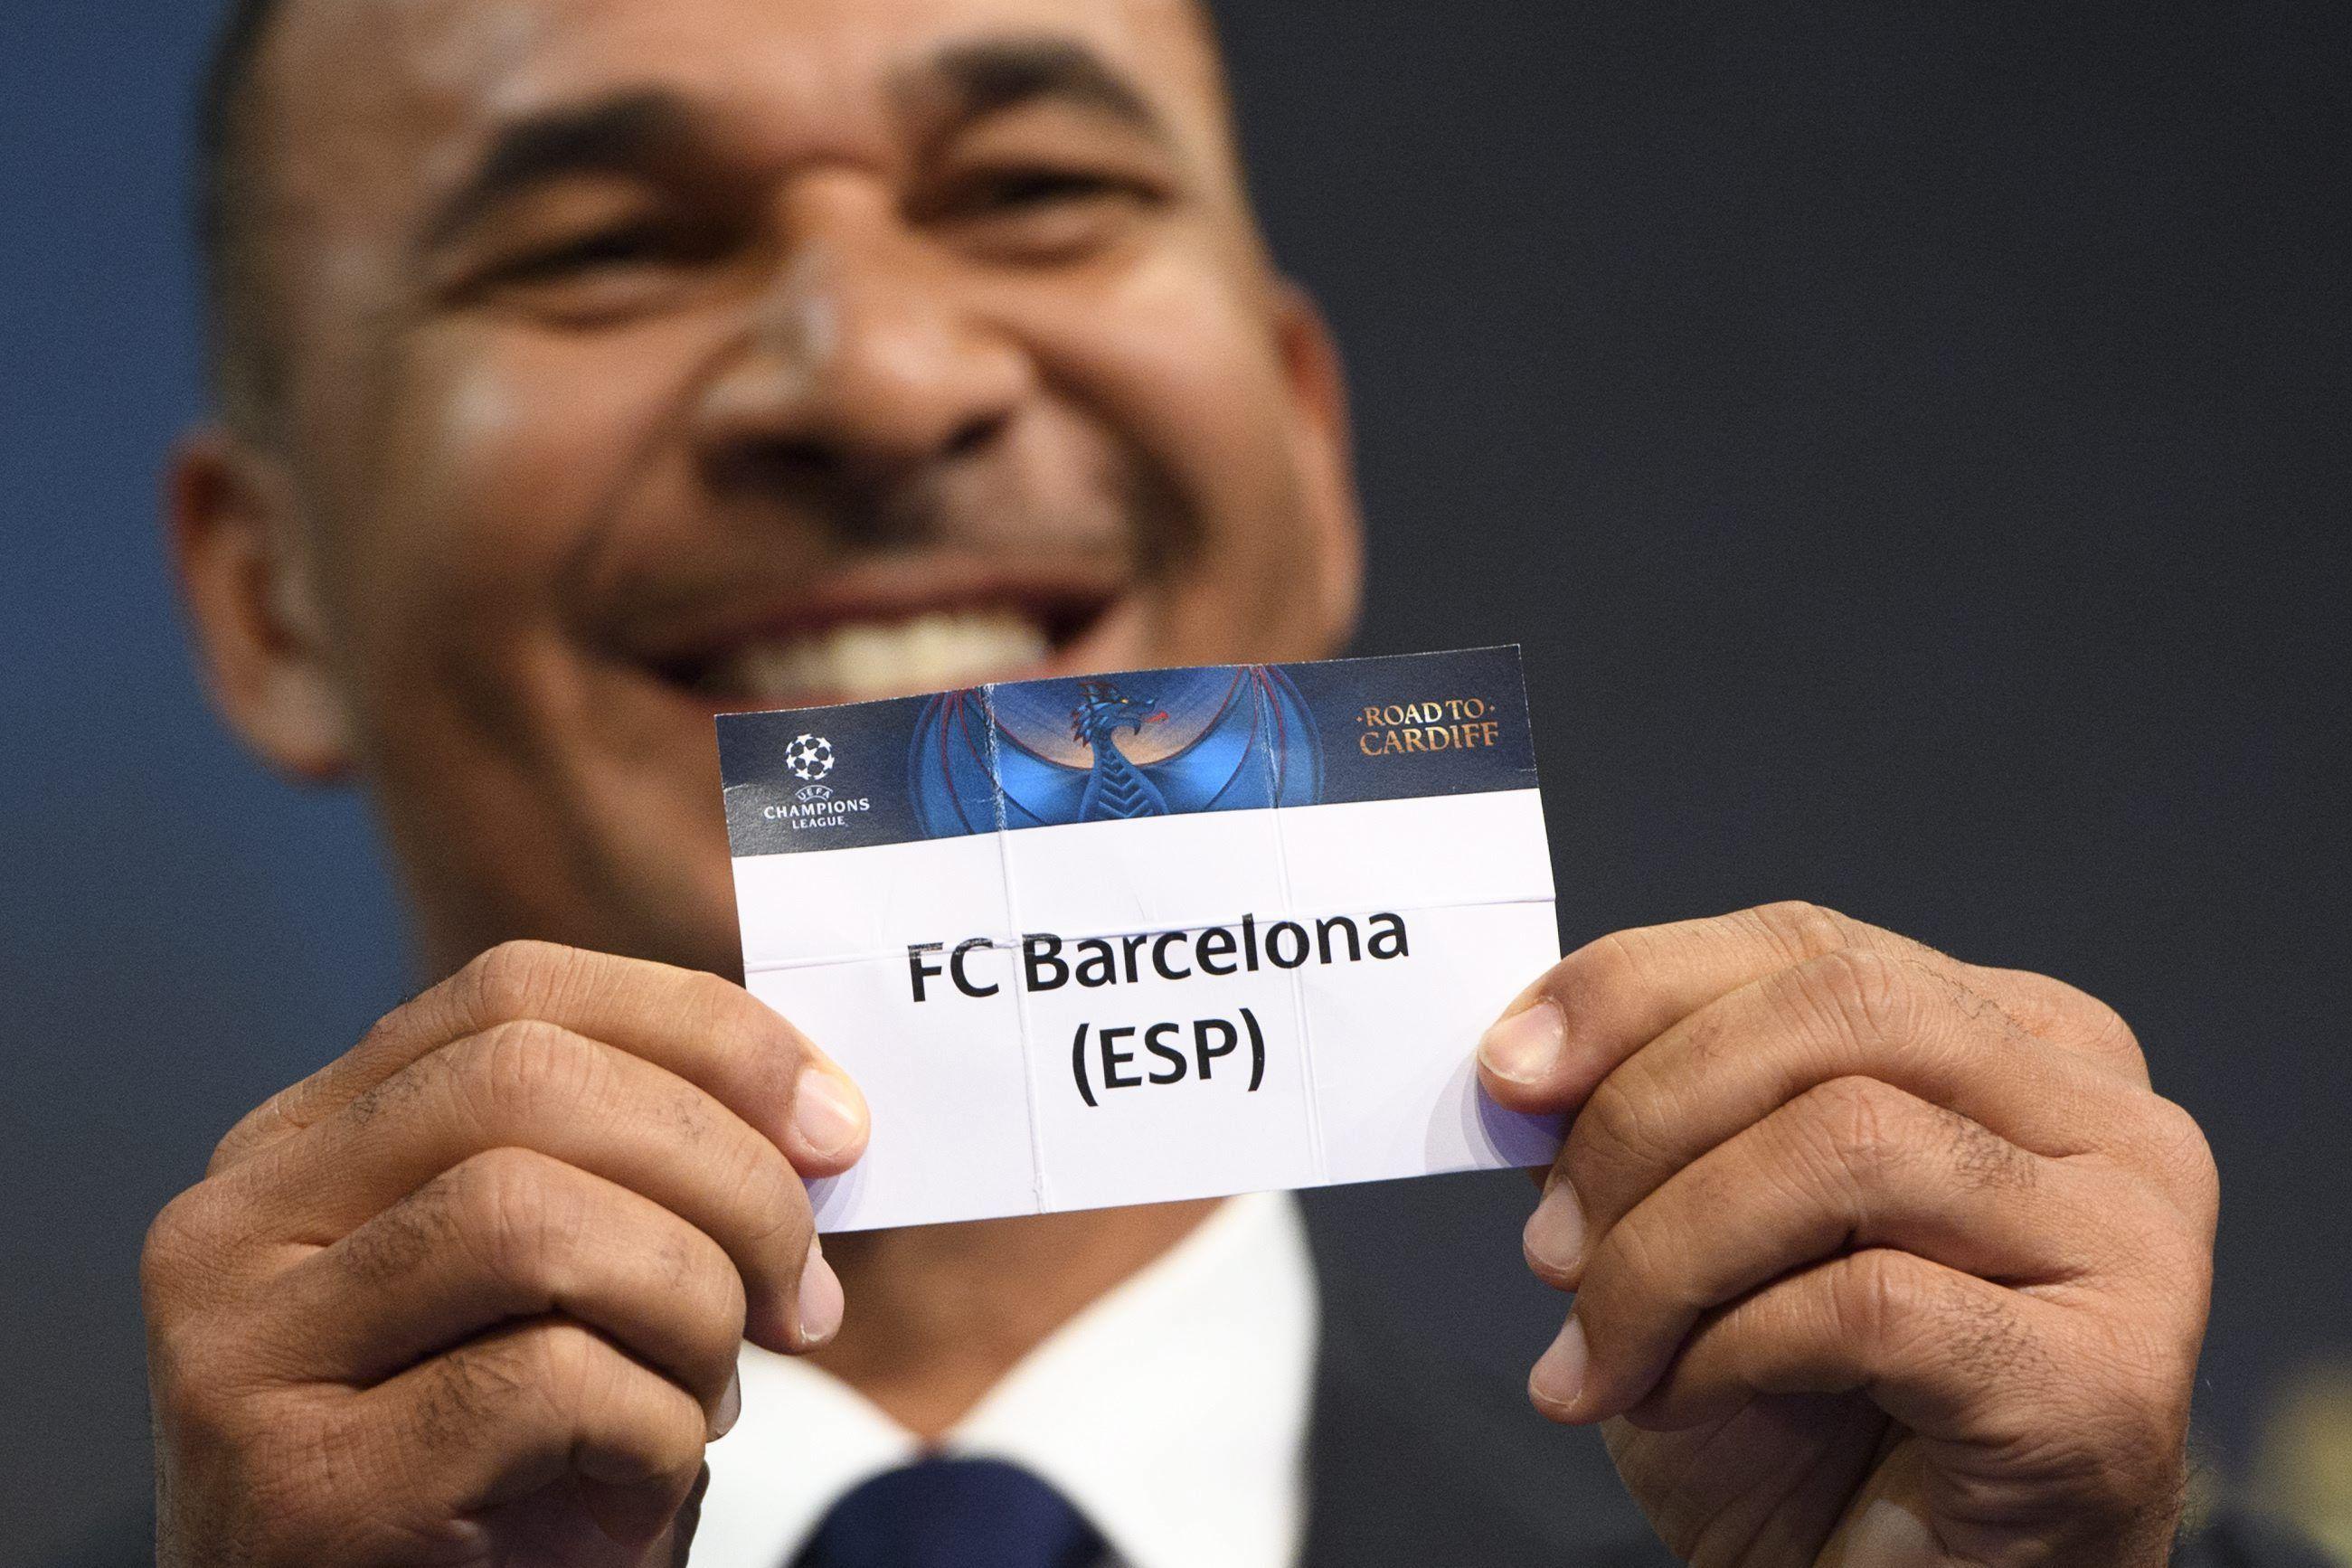 FC Barcelona Sorteig Champions League   EFE.